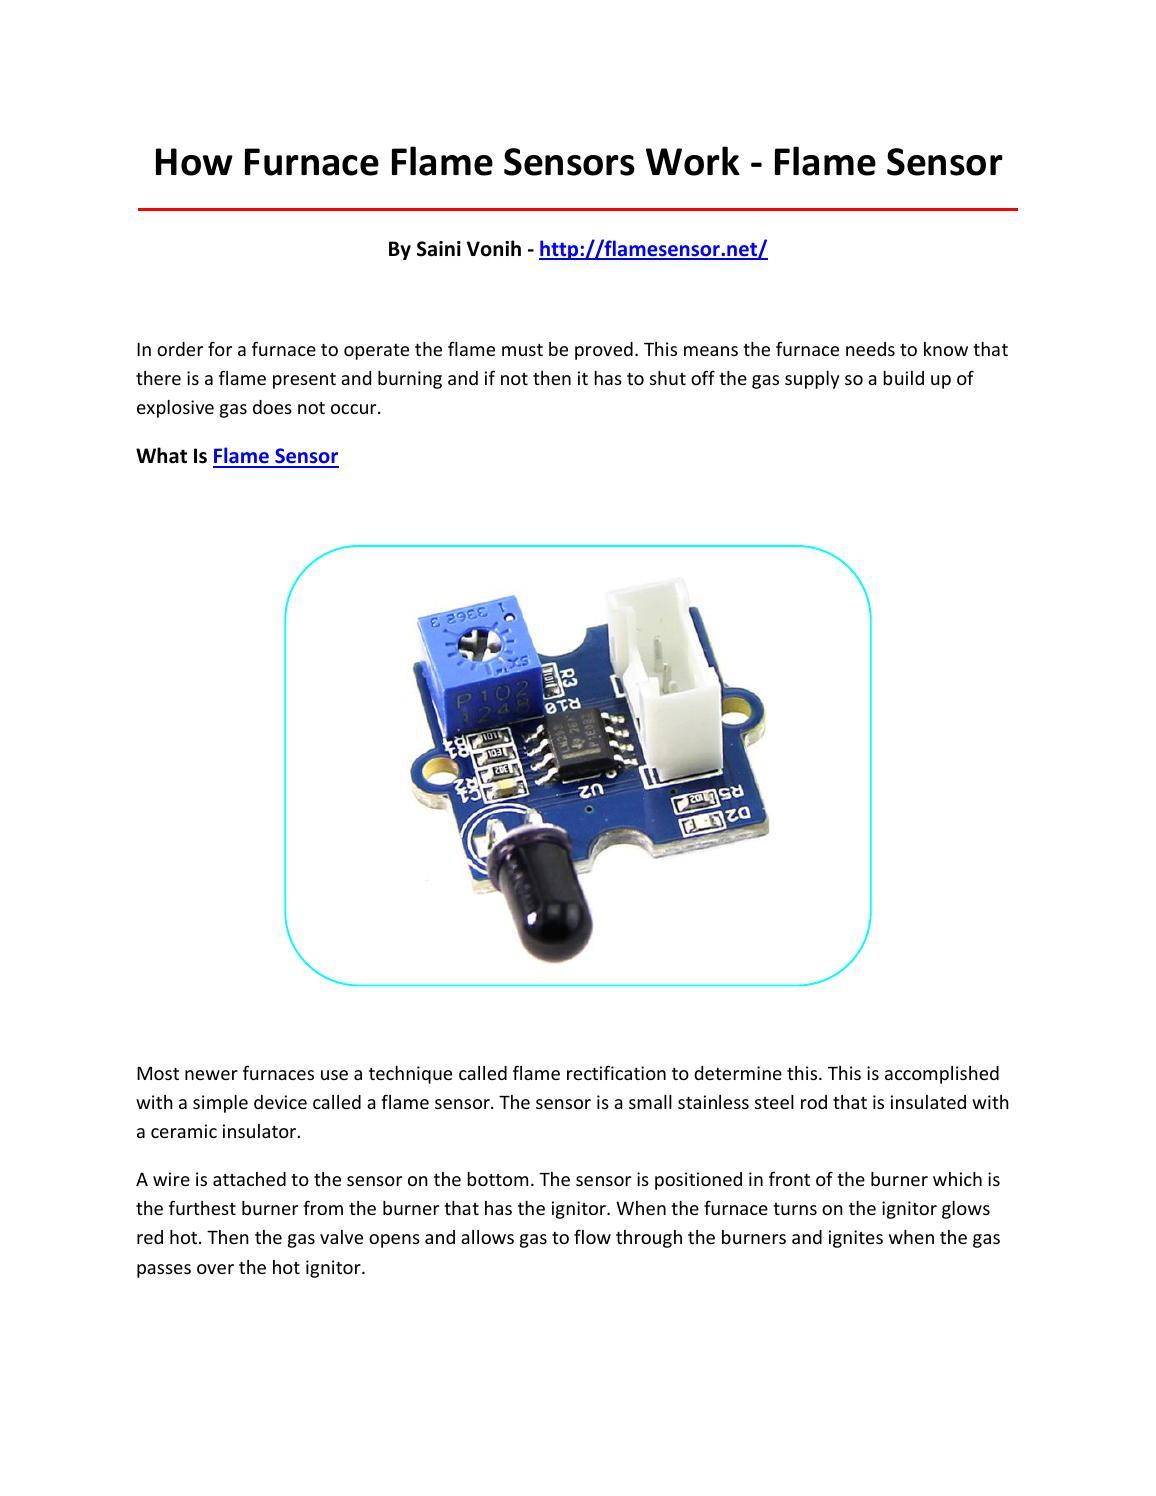 Flame sensor by seweowr - issuu